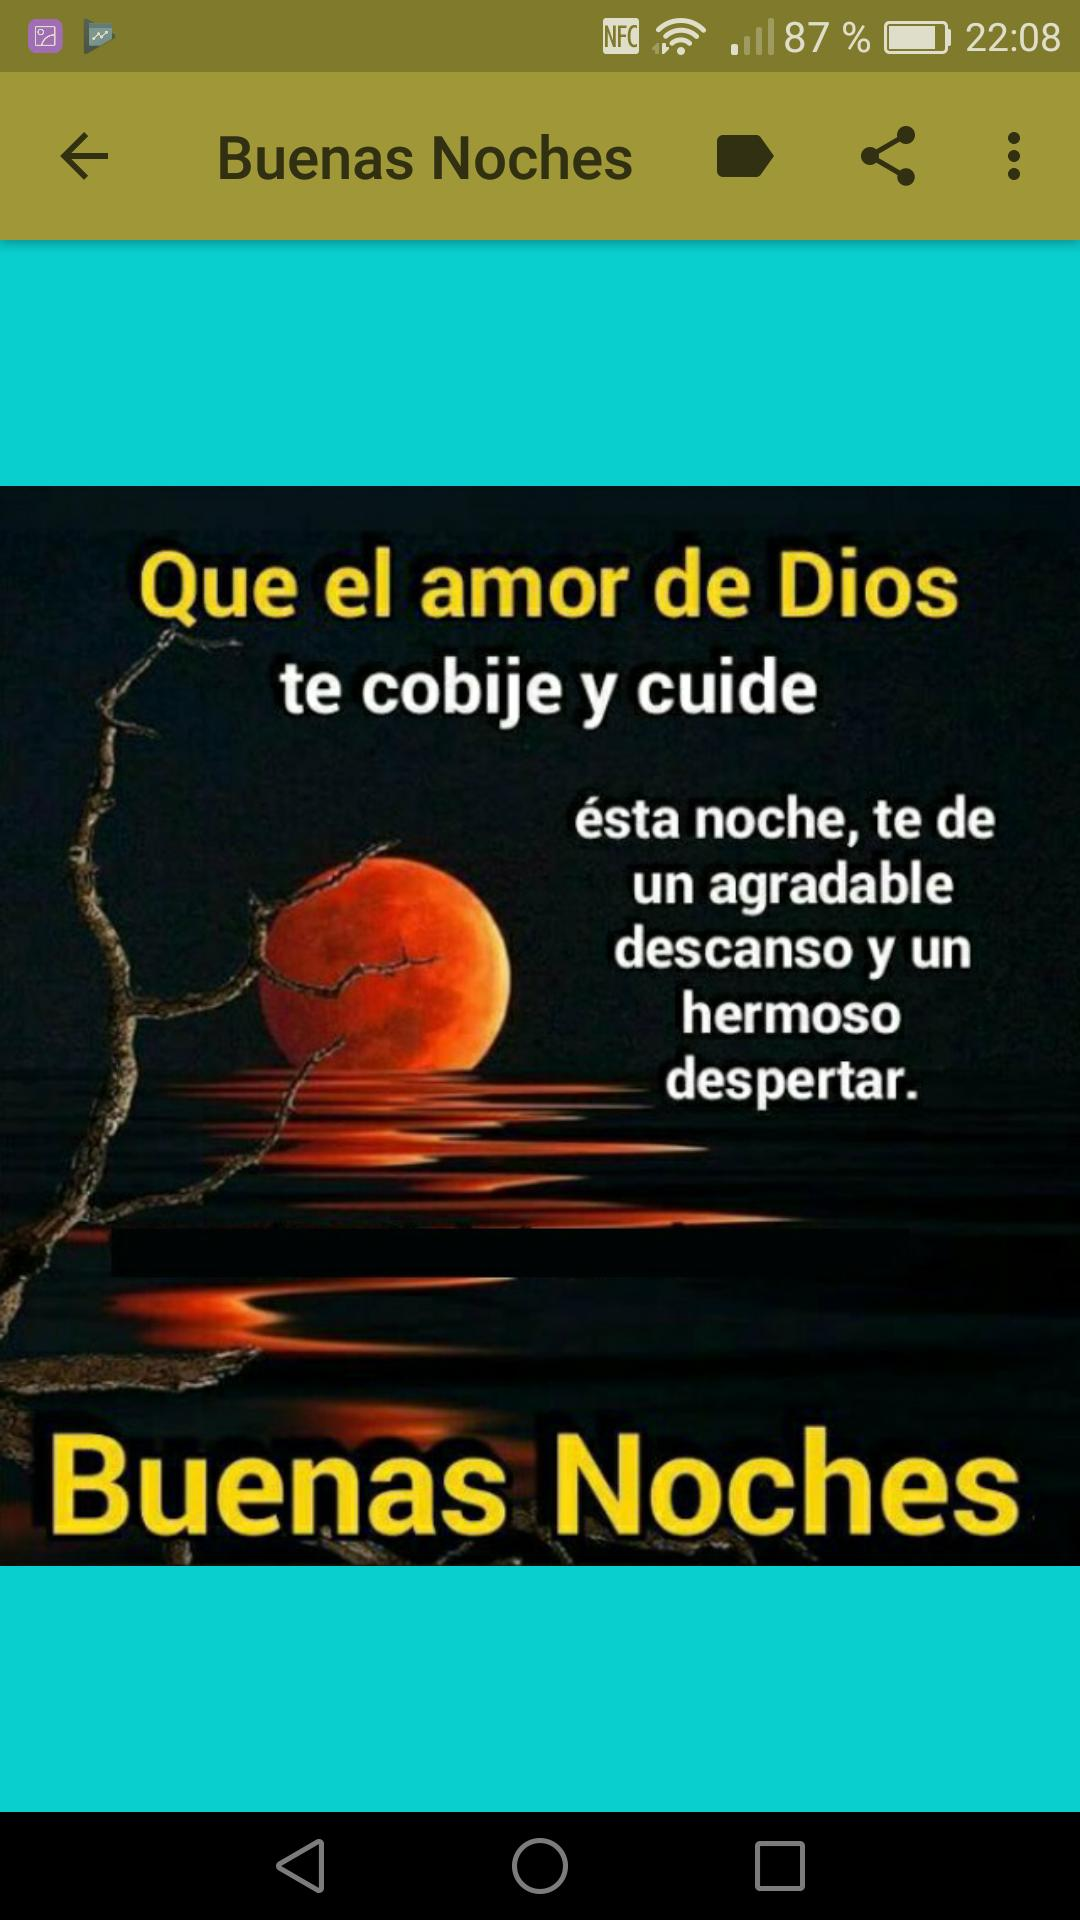 Frases Cristianas De Buenas Noches Pour Android